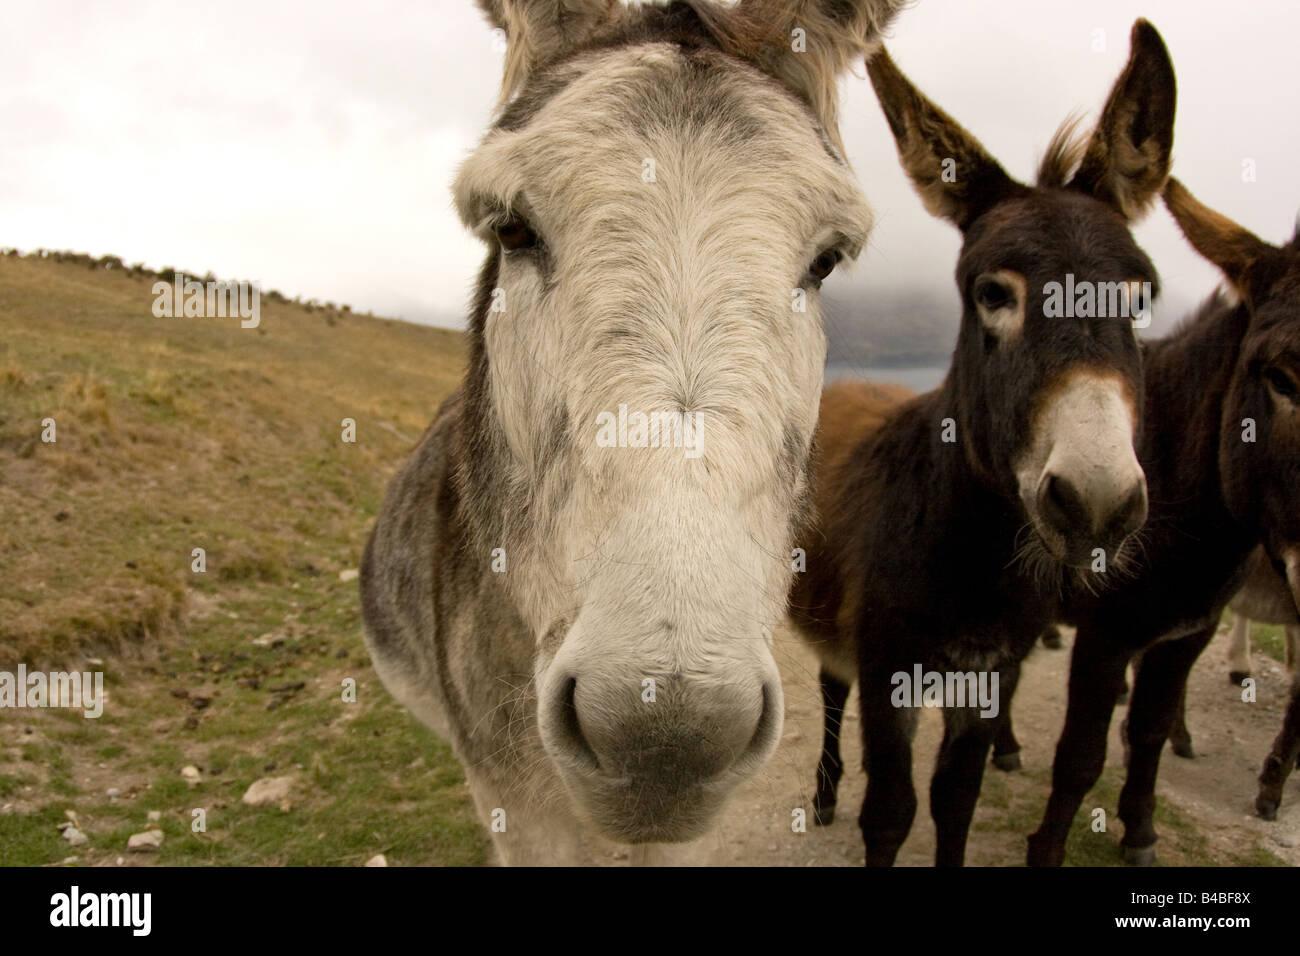 Close up portraits of Donkeys expecting food Stock Photo